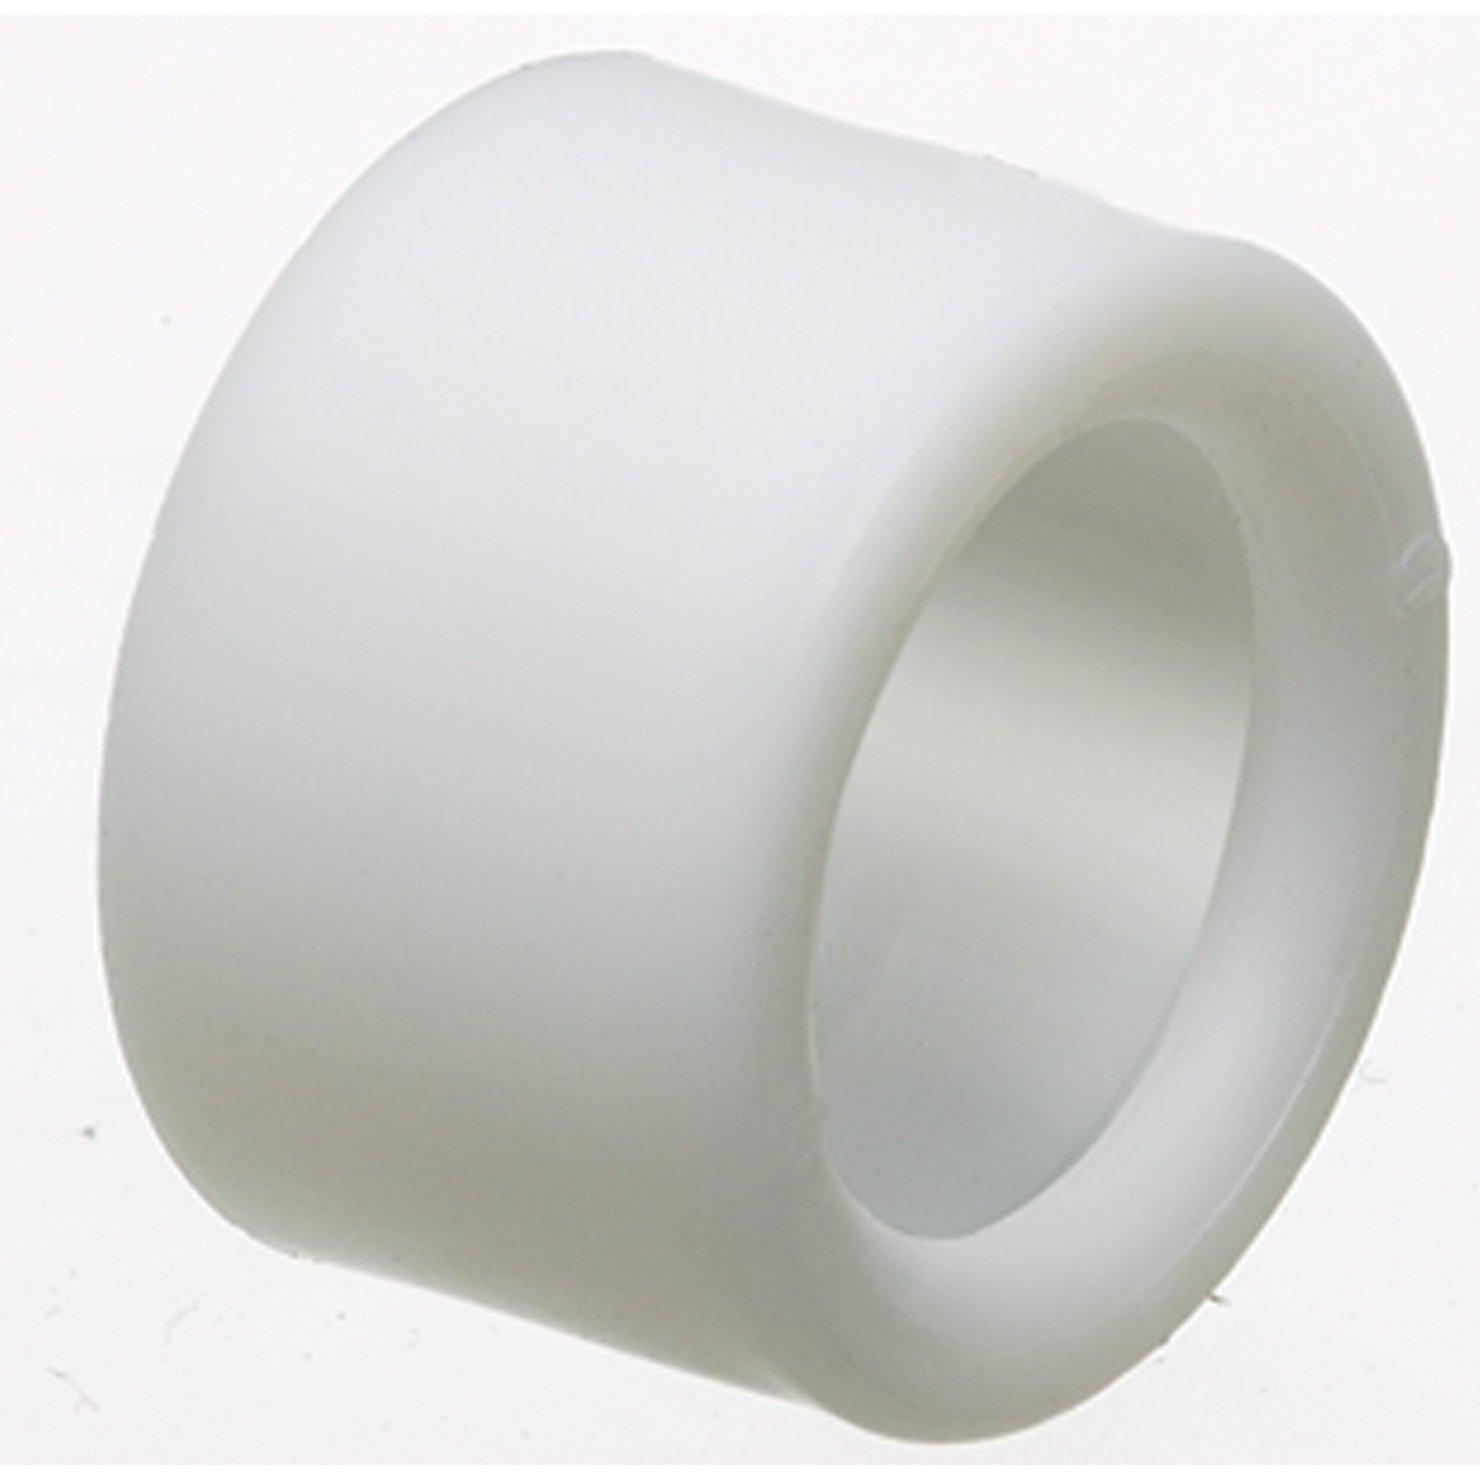 Arlington EMT100-100 EMT Insulating Conduit Bushing for Electrical Metal Tubing, White, 1-Inch, 100-Pack